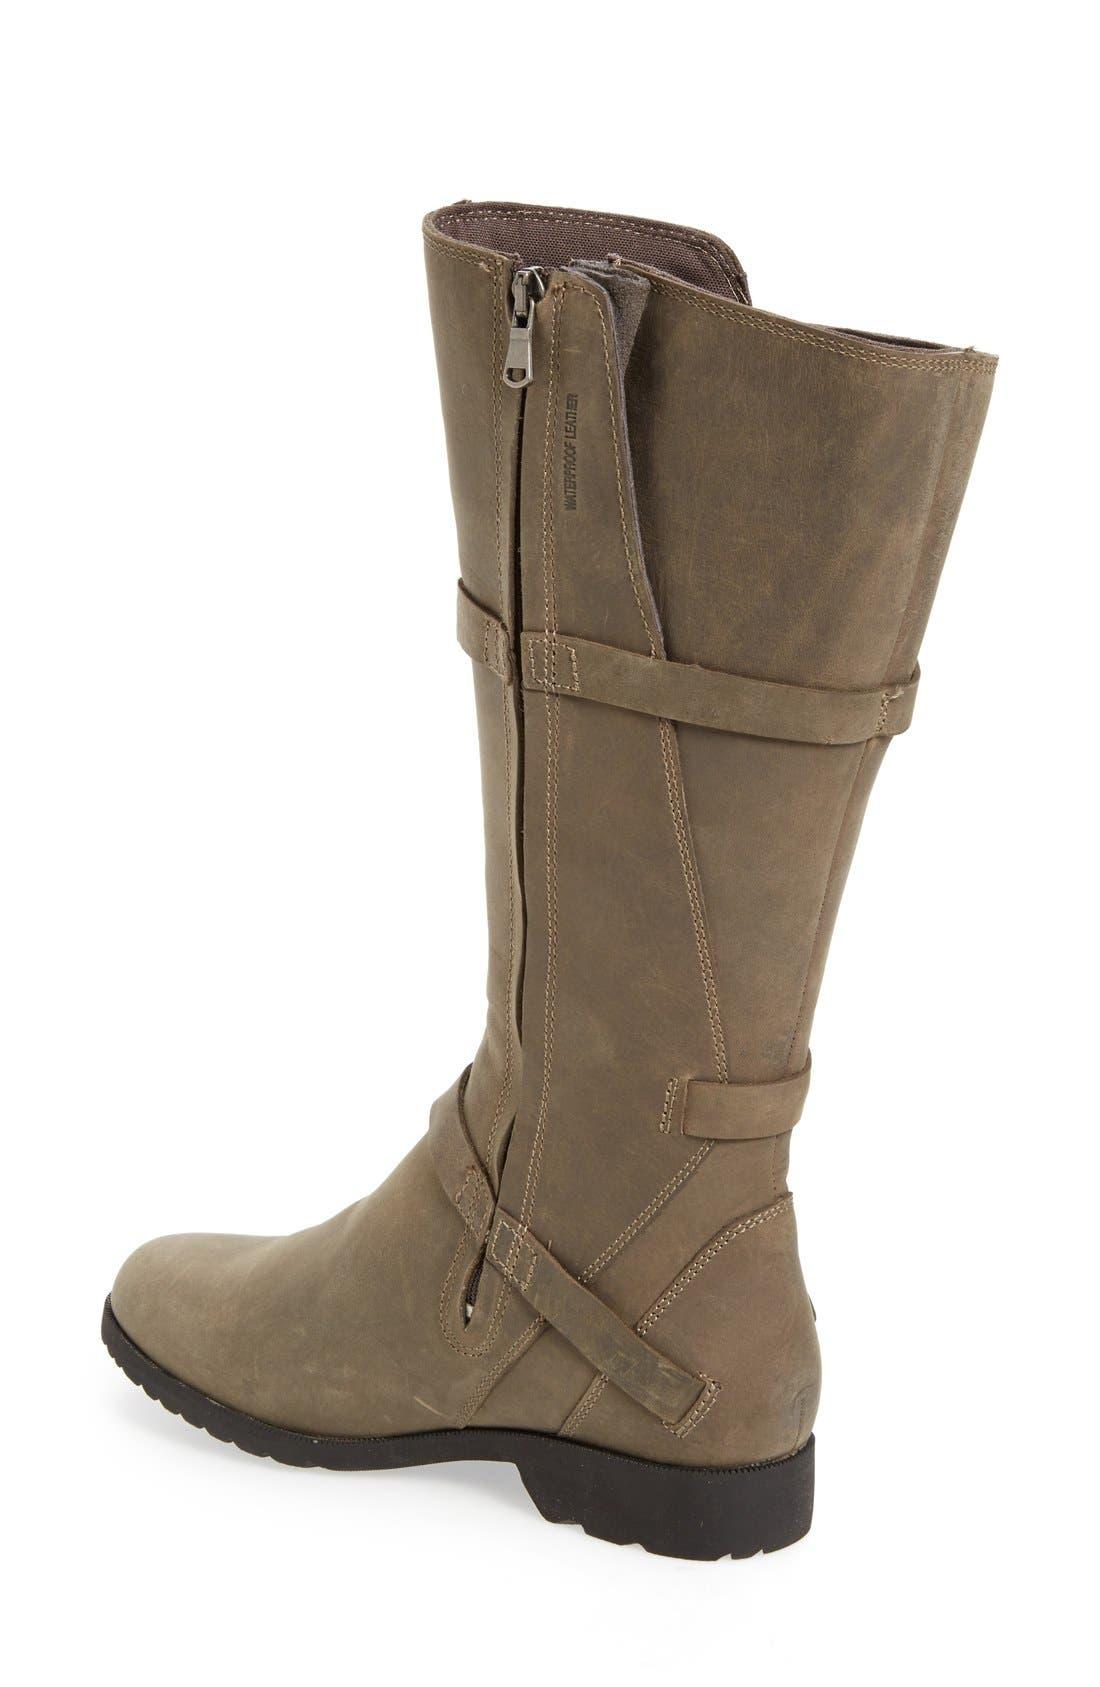 Alternate Image 2  - Teva 'De La Vina' Waterproof Riding Boot (Women)